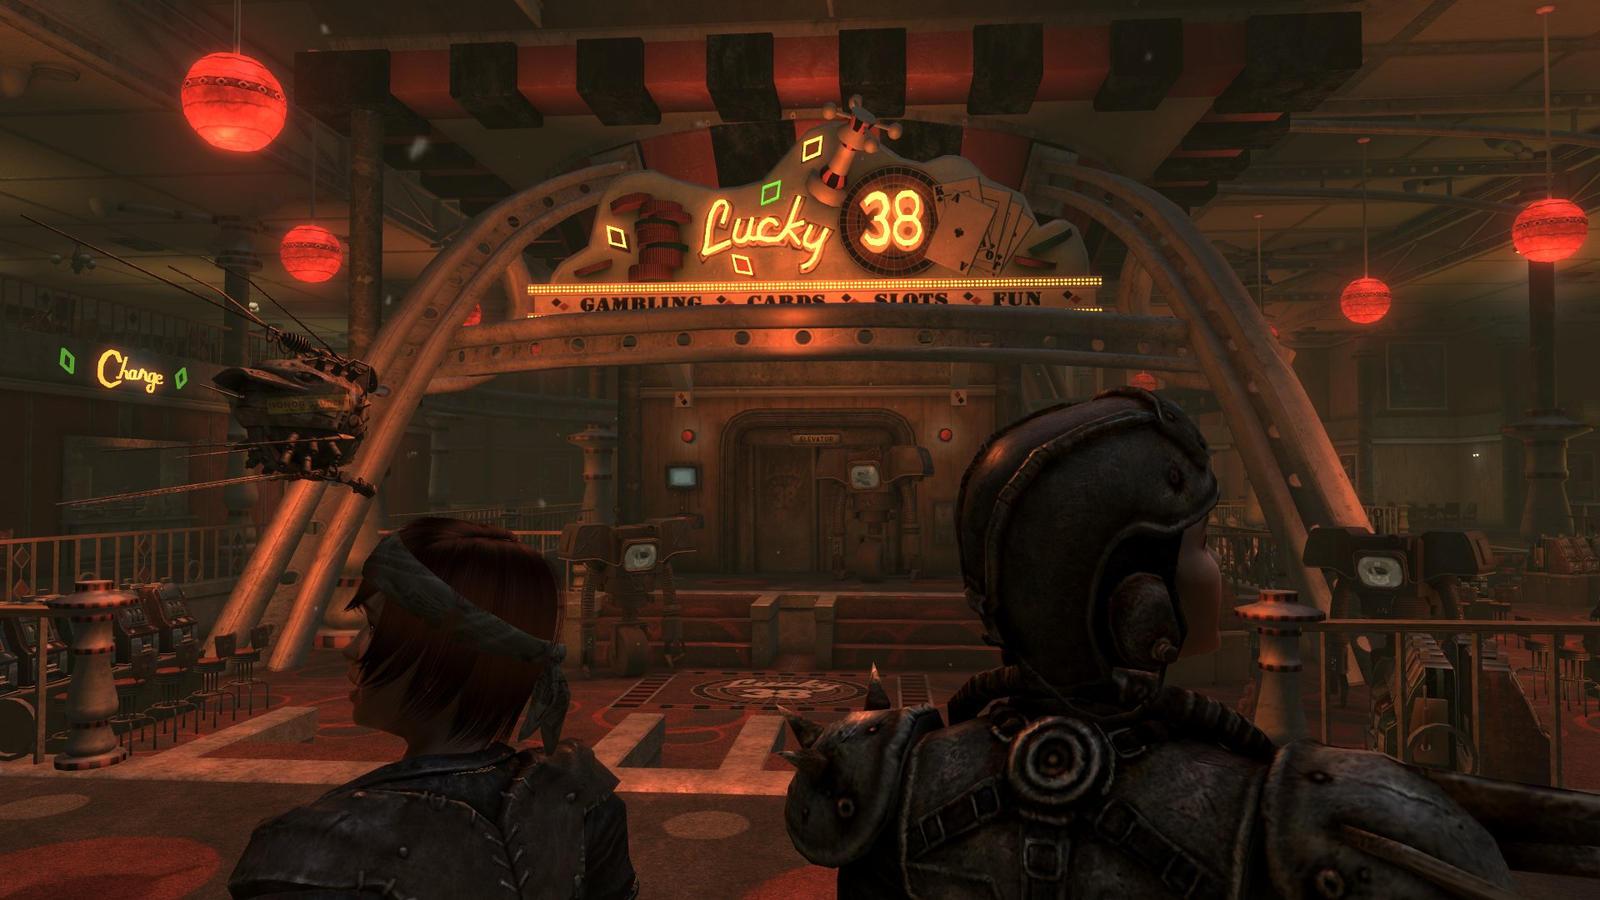 Lucky 38 casino